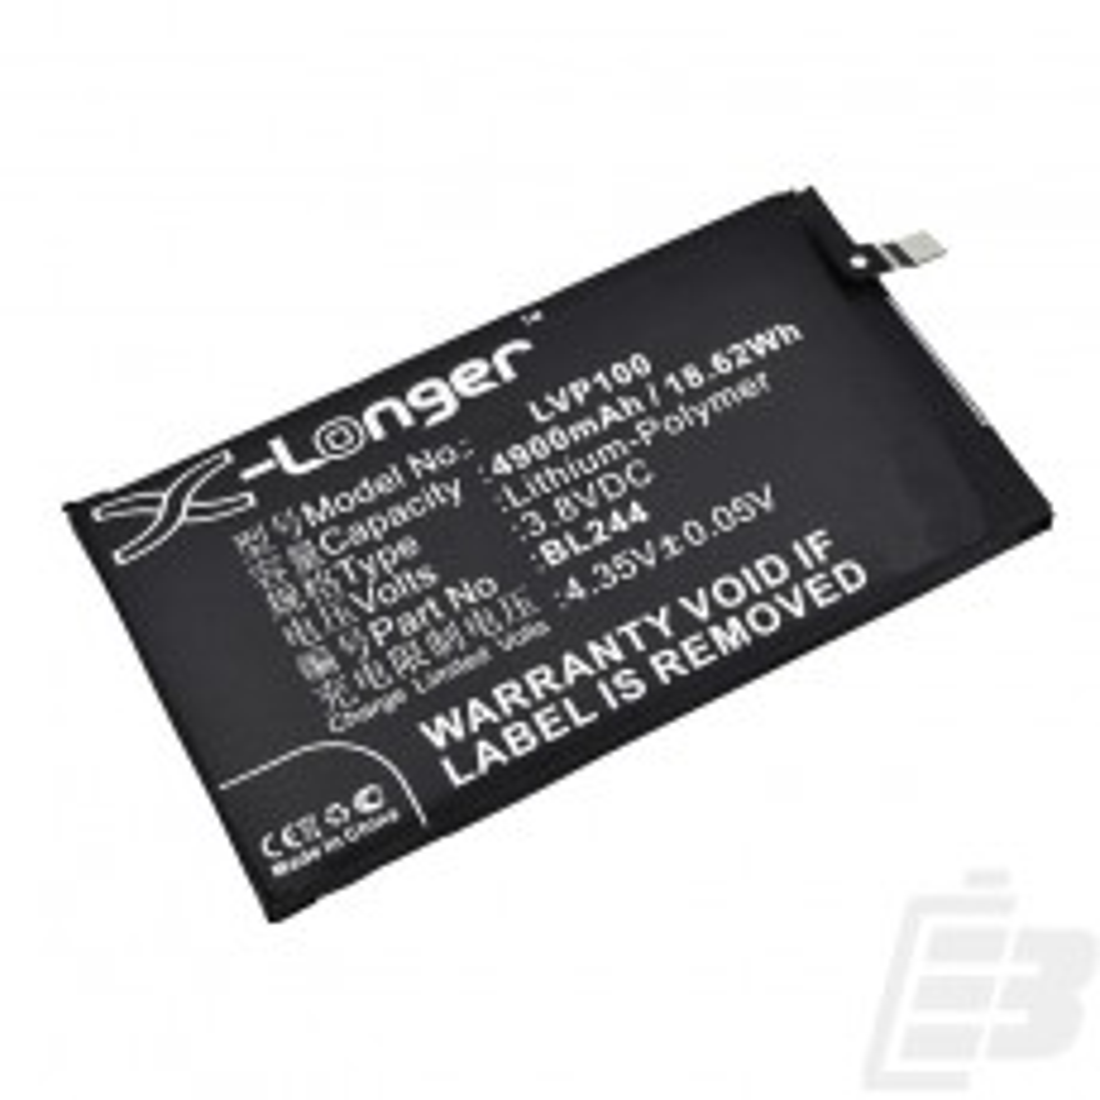 Smartphone battery Lenovo Vibe P1_1